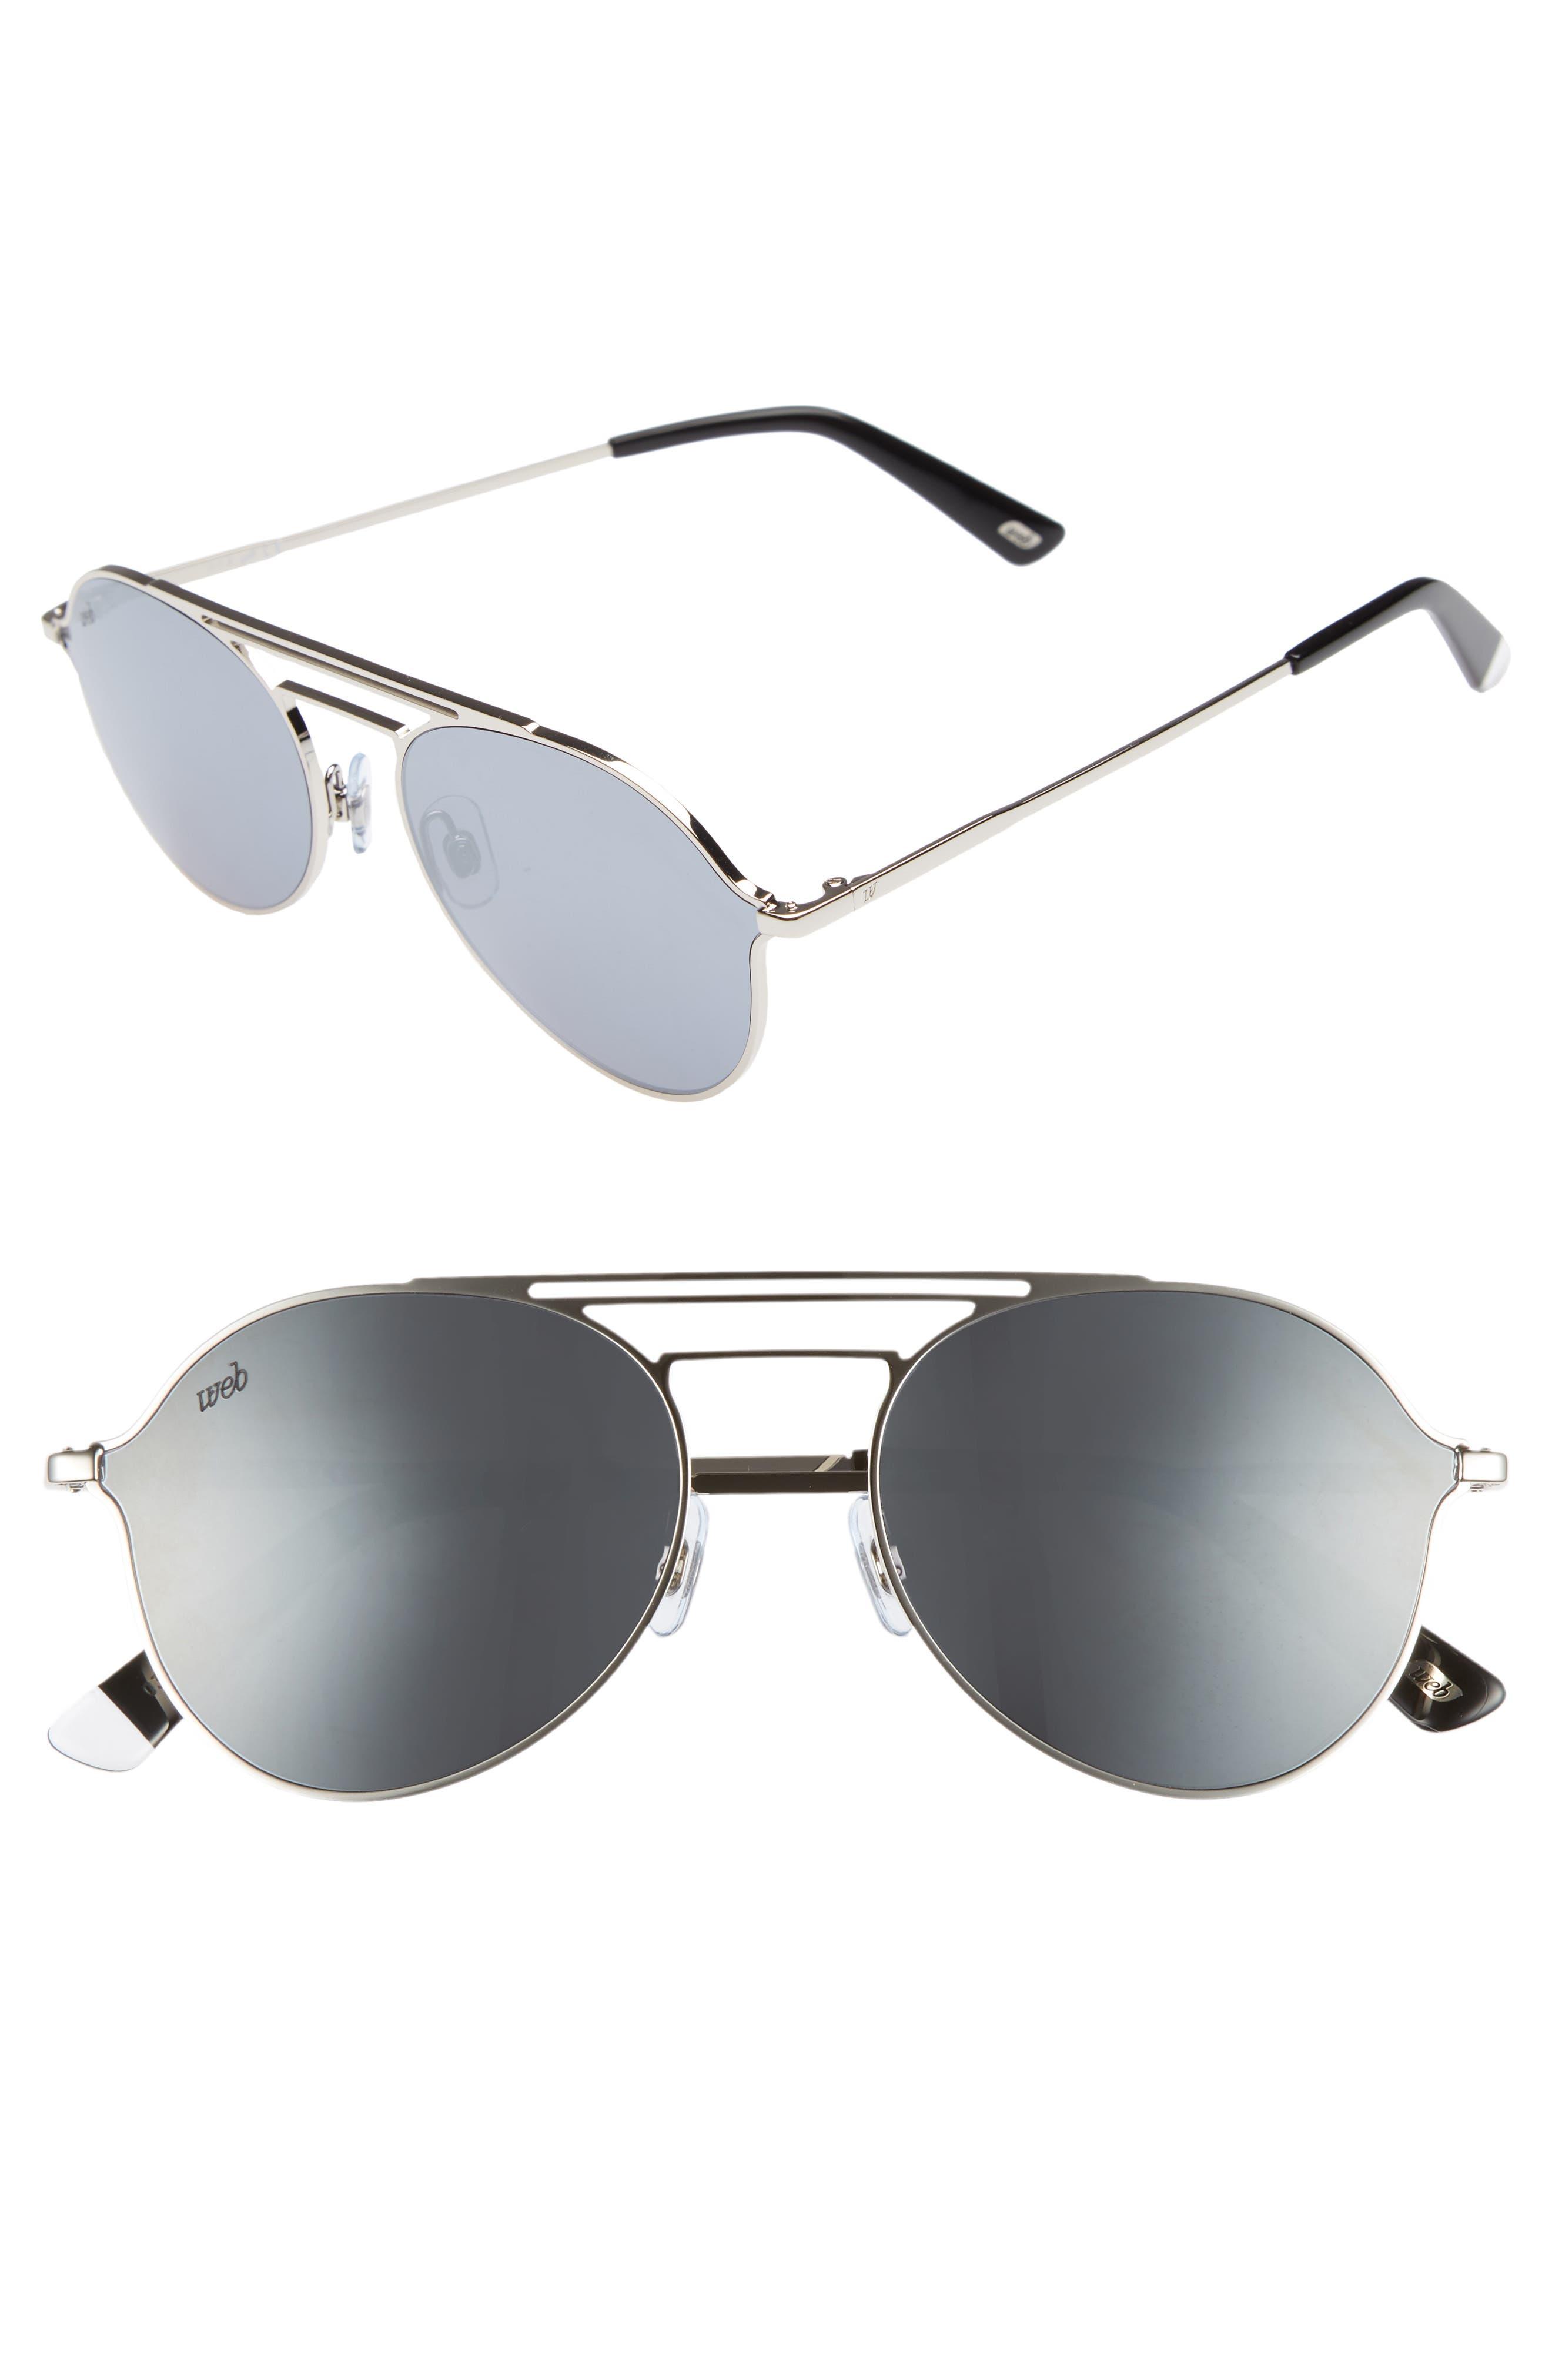 56mm Aviator Sunglasses,                             Main thumbnail 1, color,                             Shiny Palladium/ Smoke Mirror